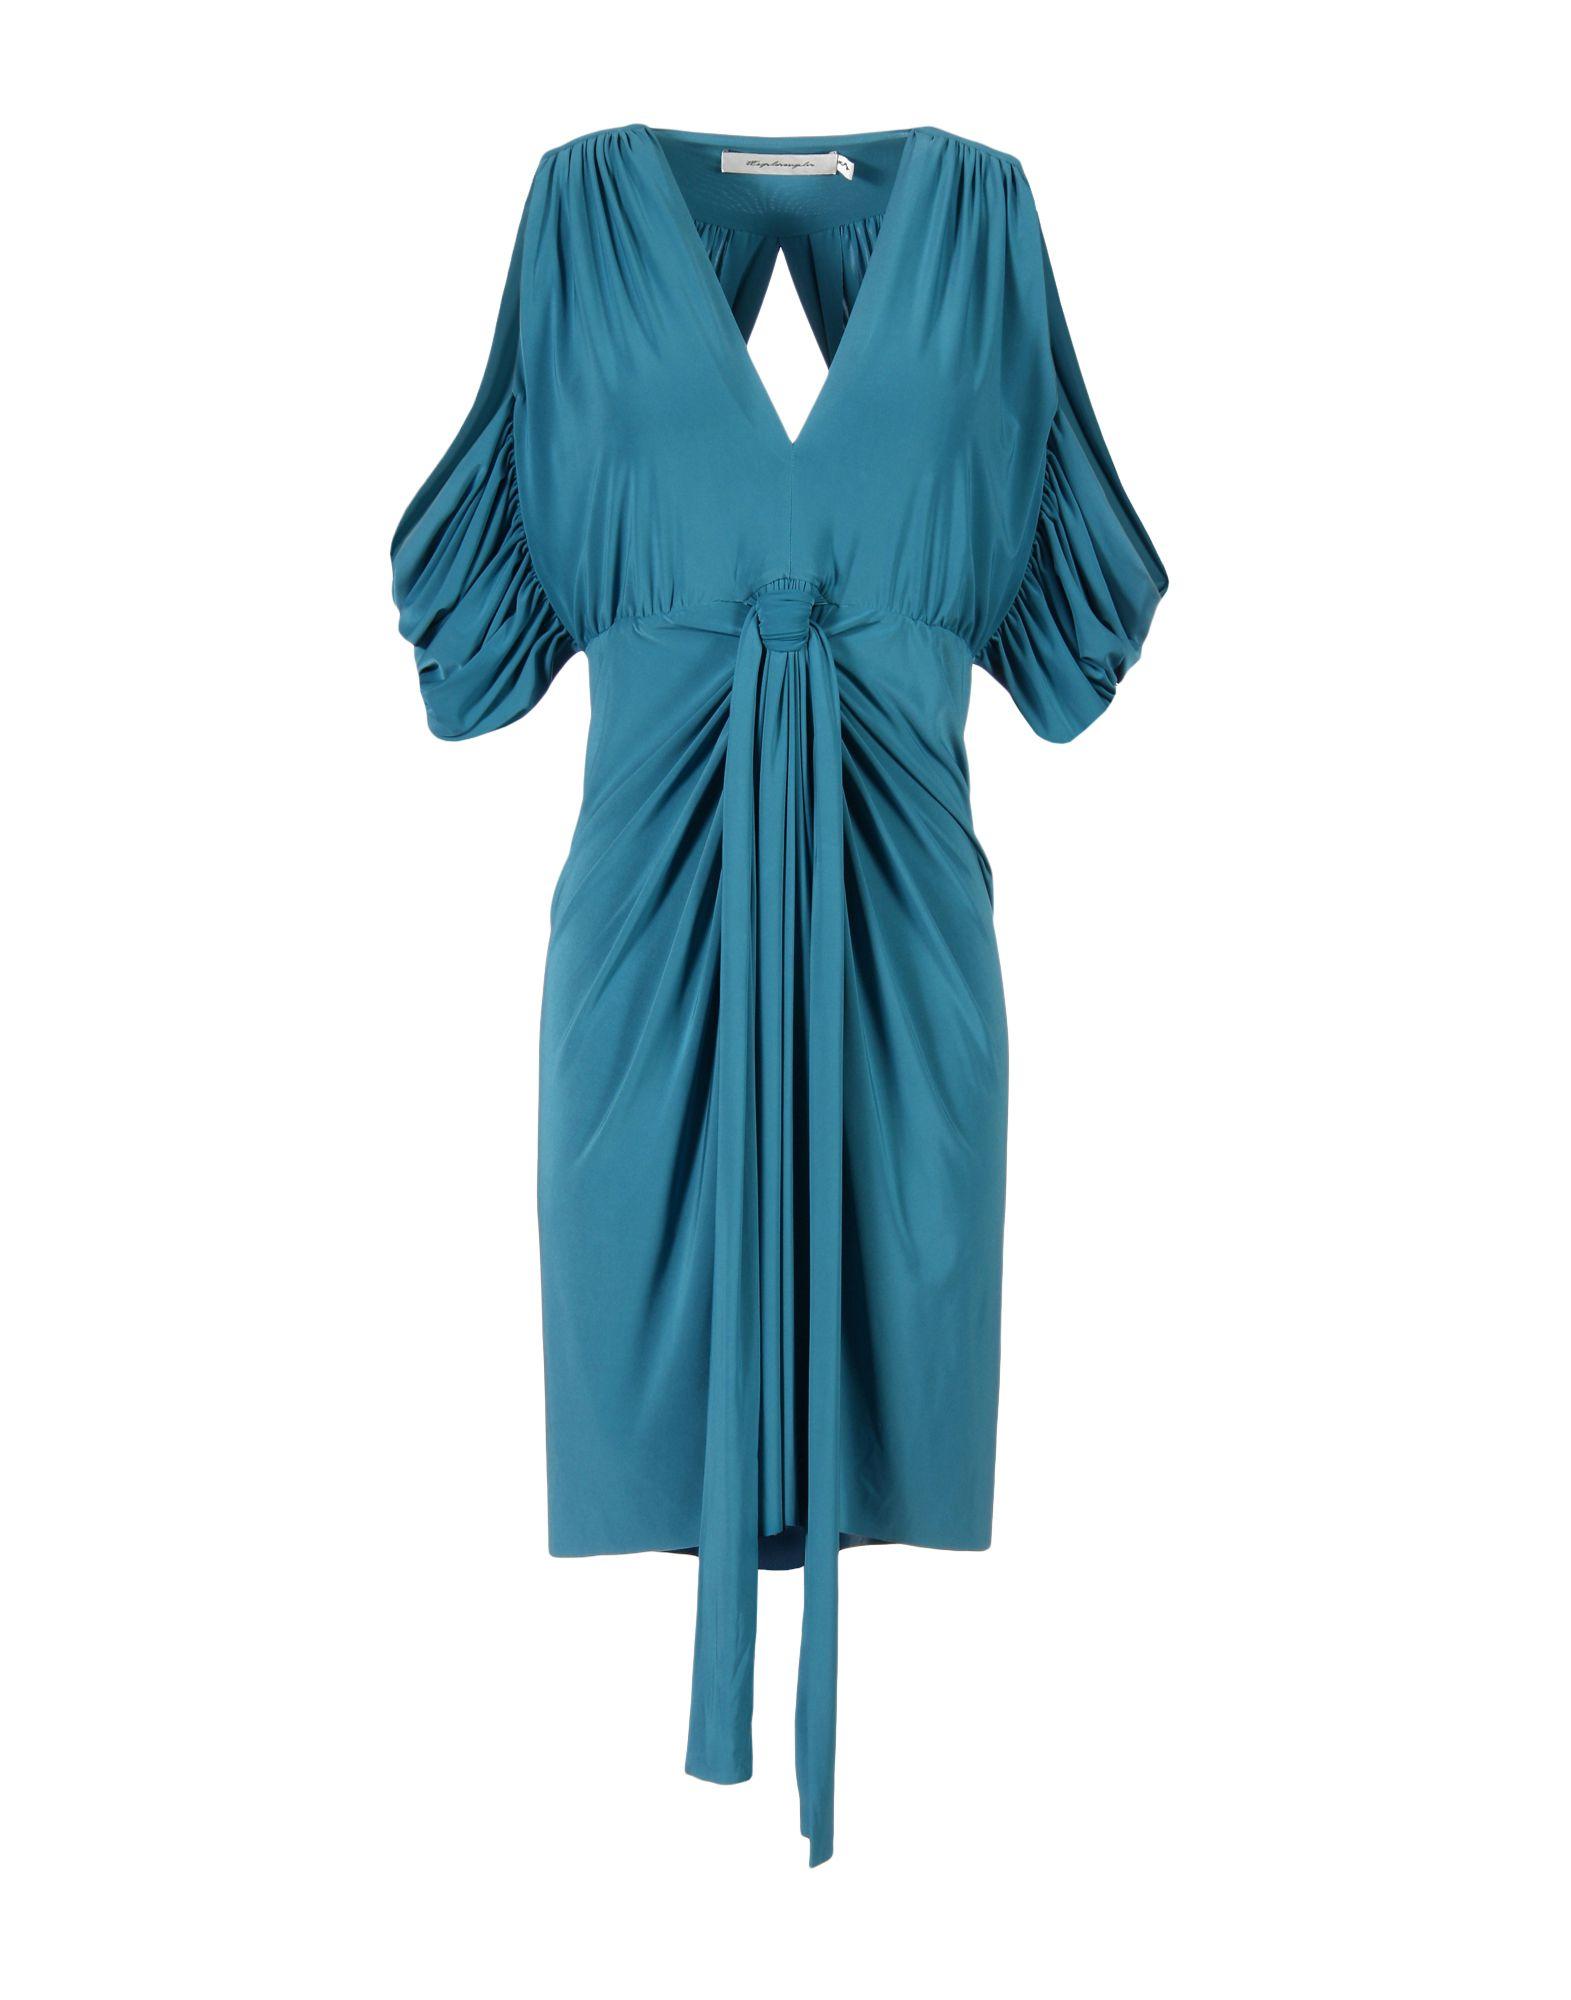 T-BAGS Short dresses